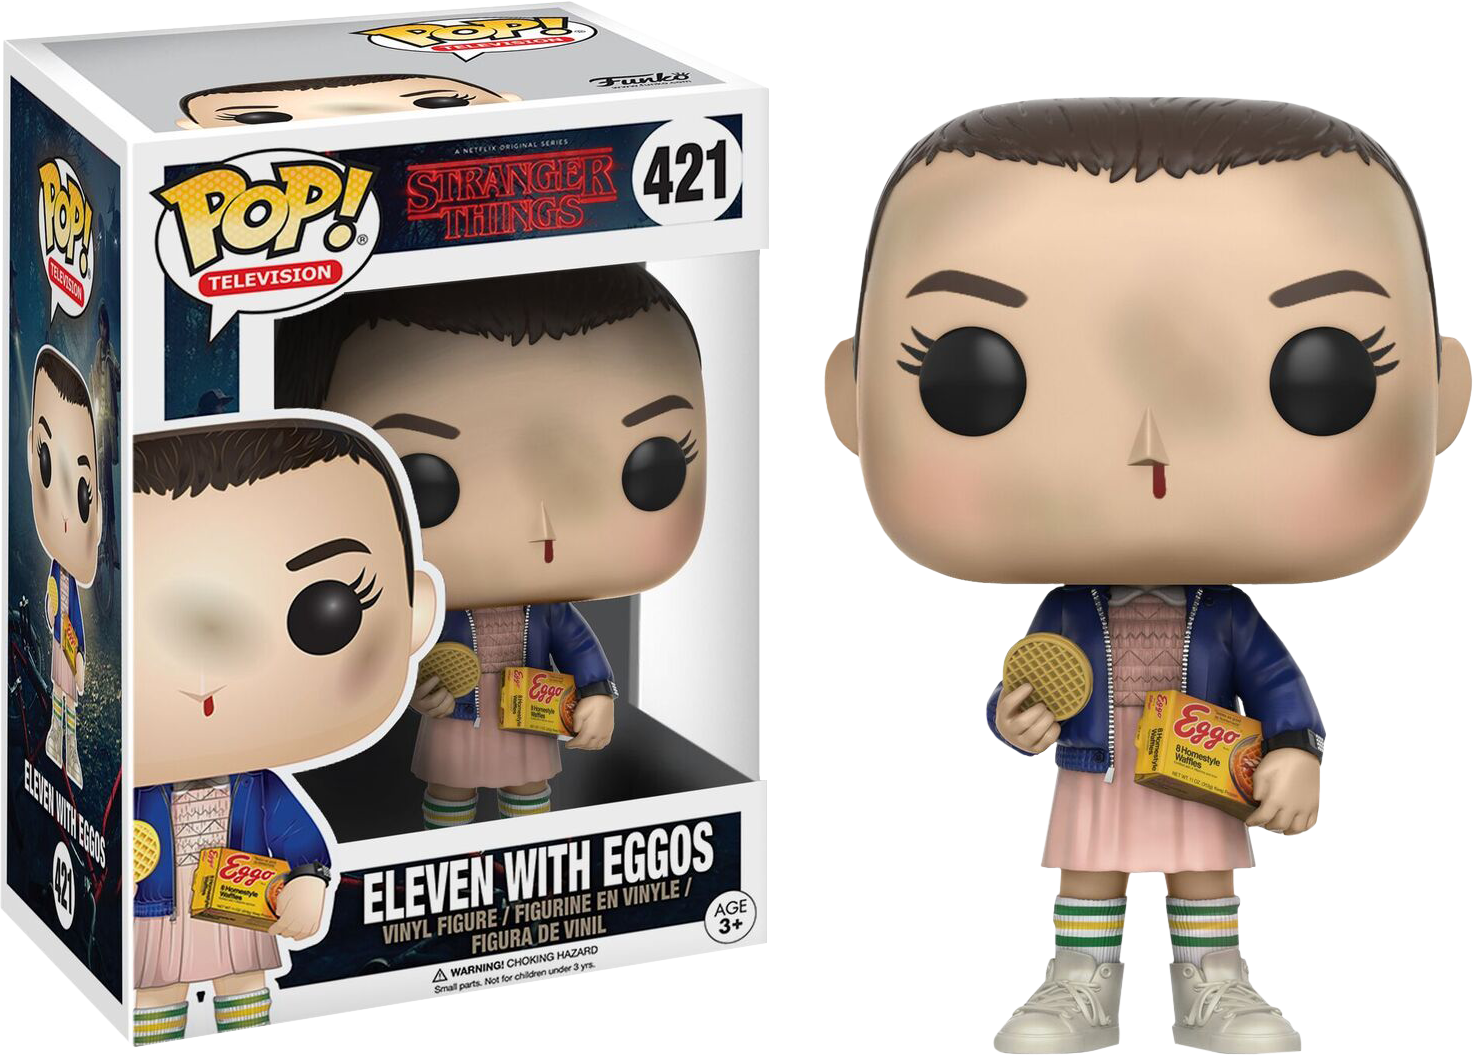 Stranger Things - Eleven with Eggos Pop! Vinyl Figure